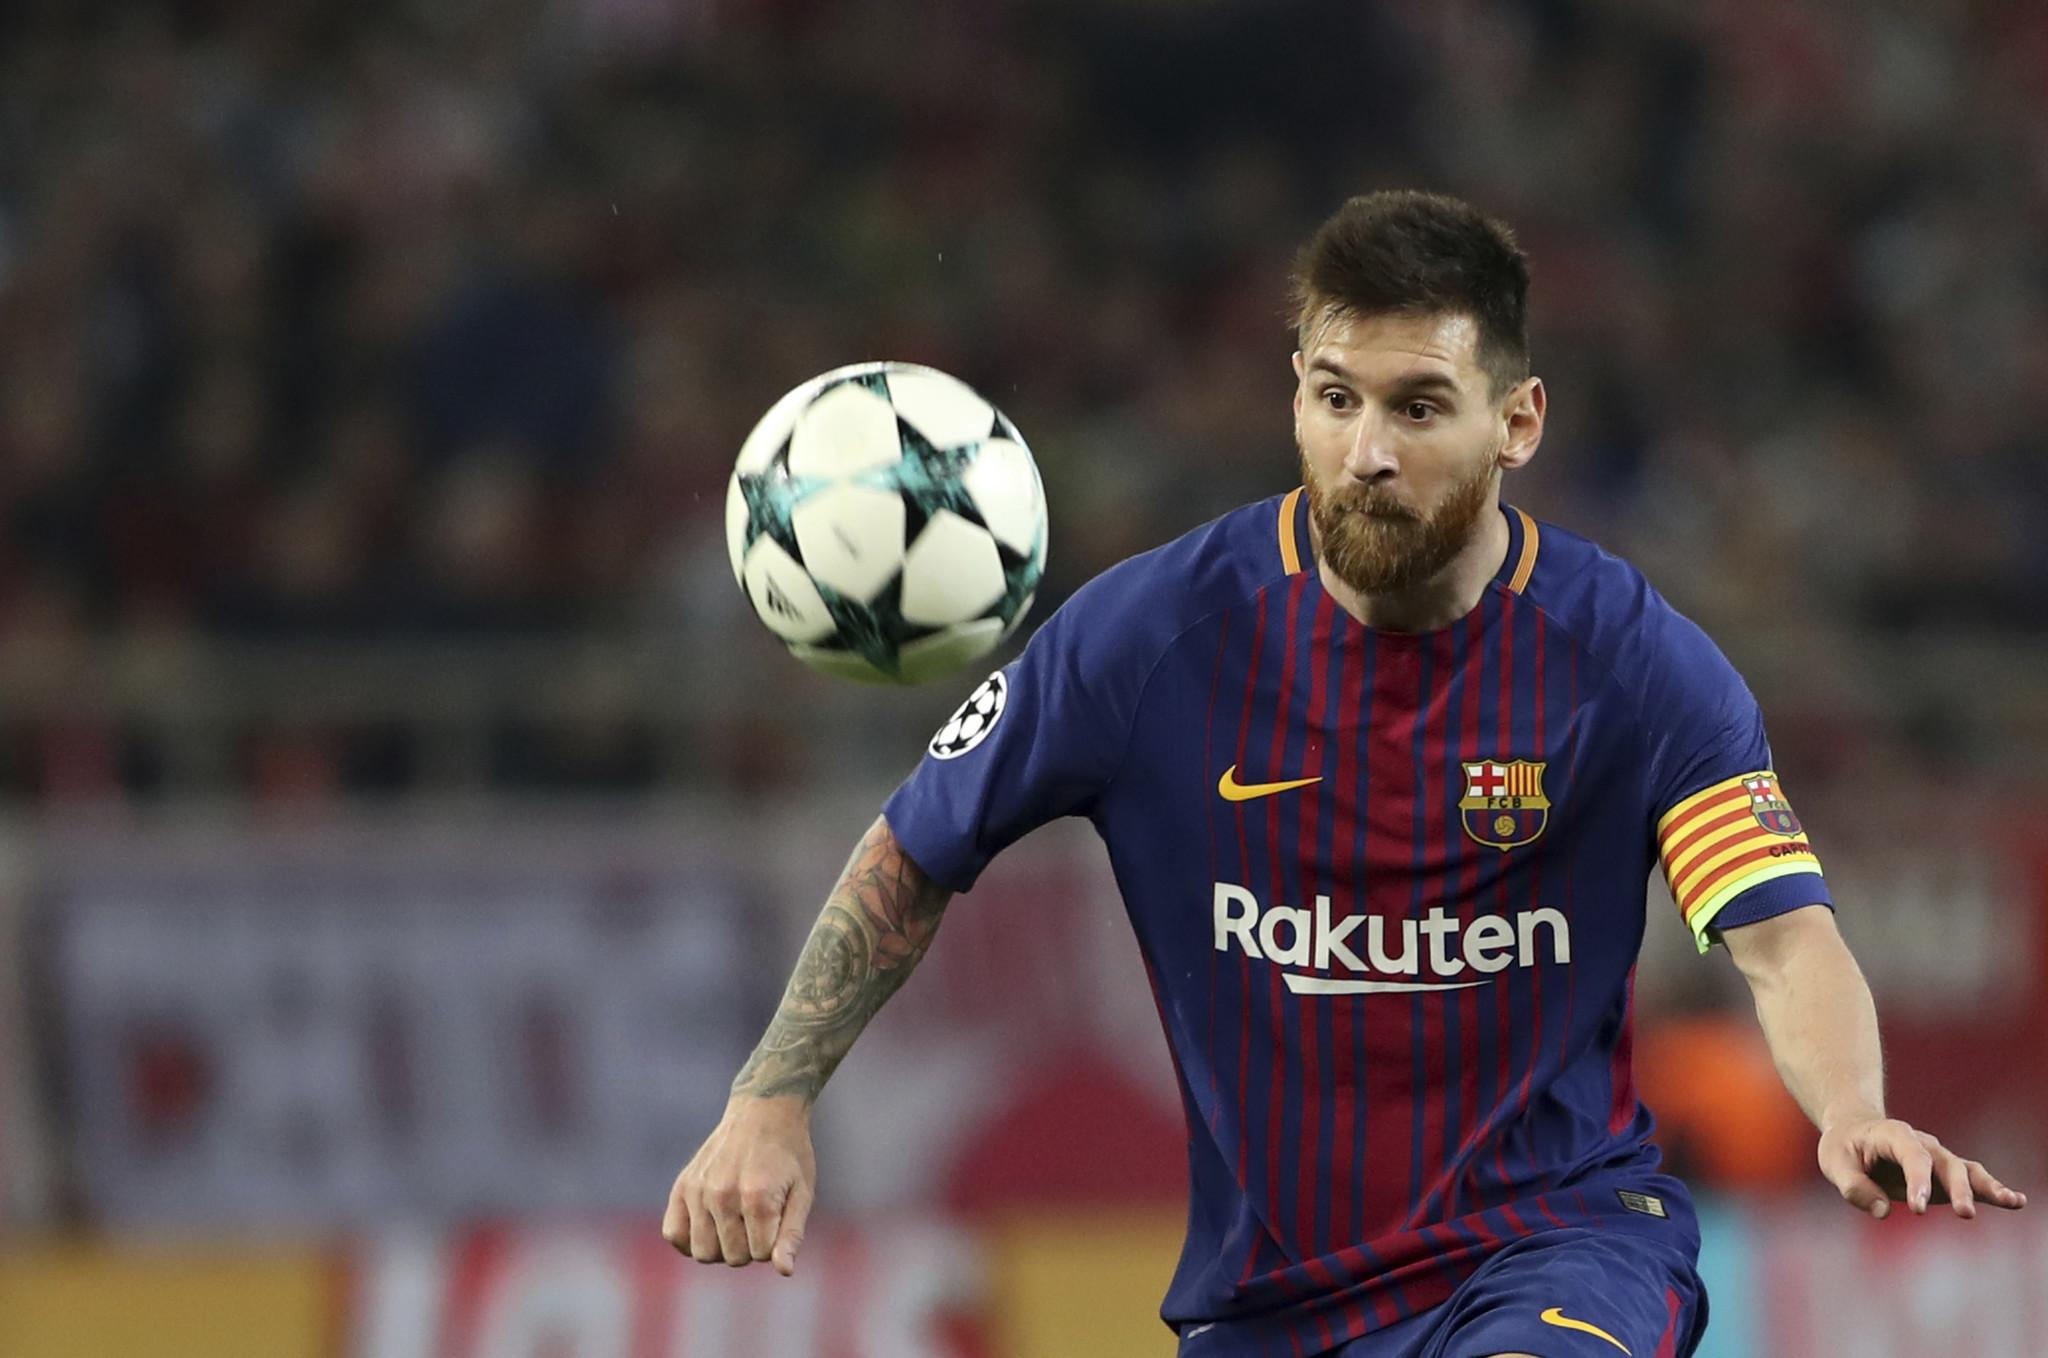 La-sp-soccer-tv-box-20171123